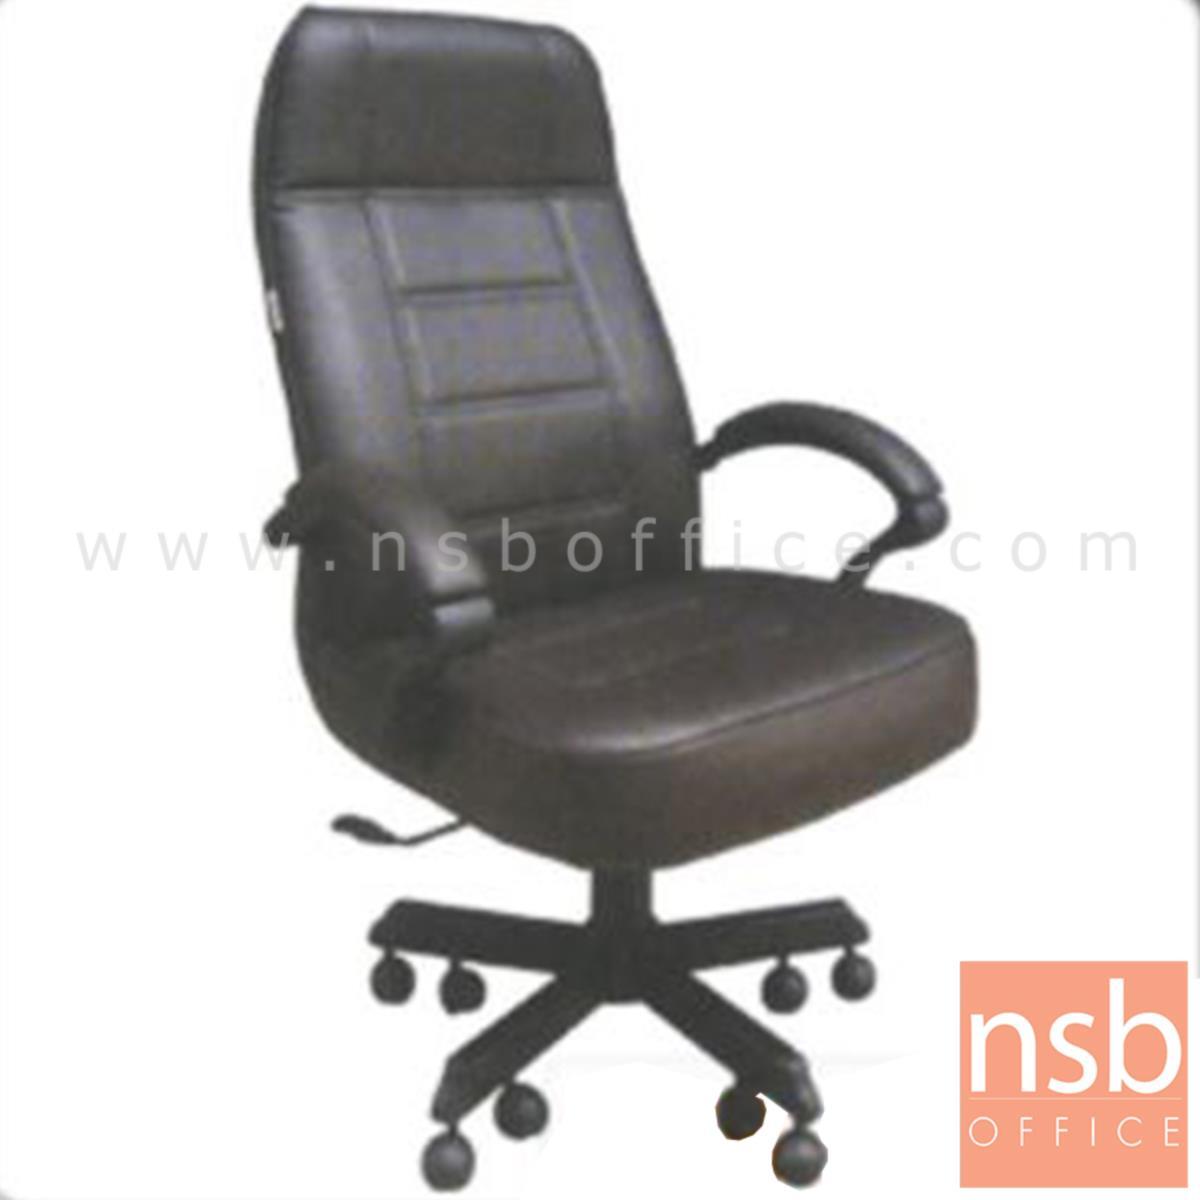 B14A121:เก้าอี้สำนักงาน รุ่น Organa  มีก้อนโยก ขาเหล็ก 10 ล้อ